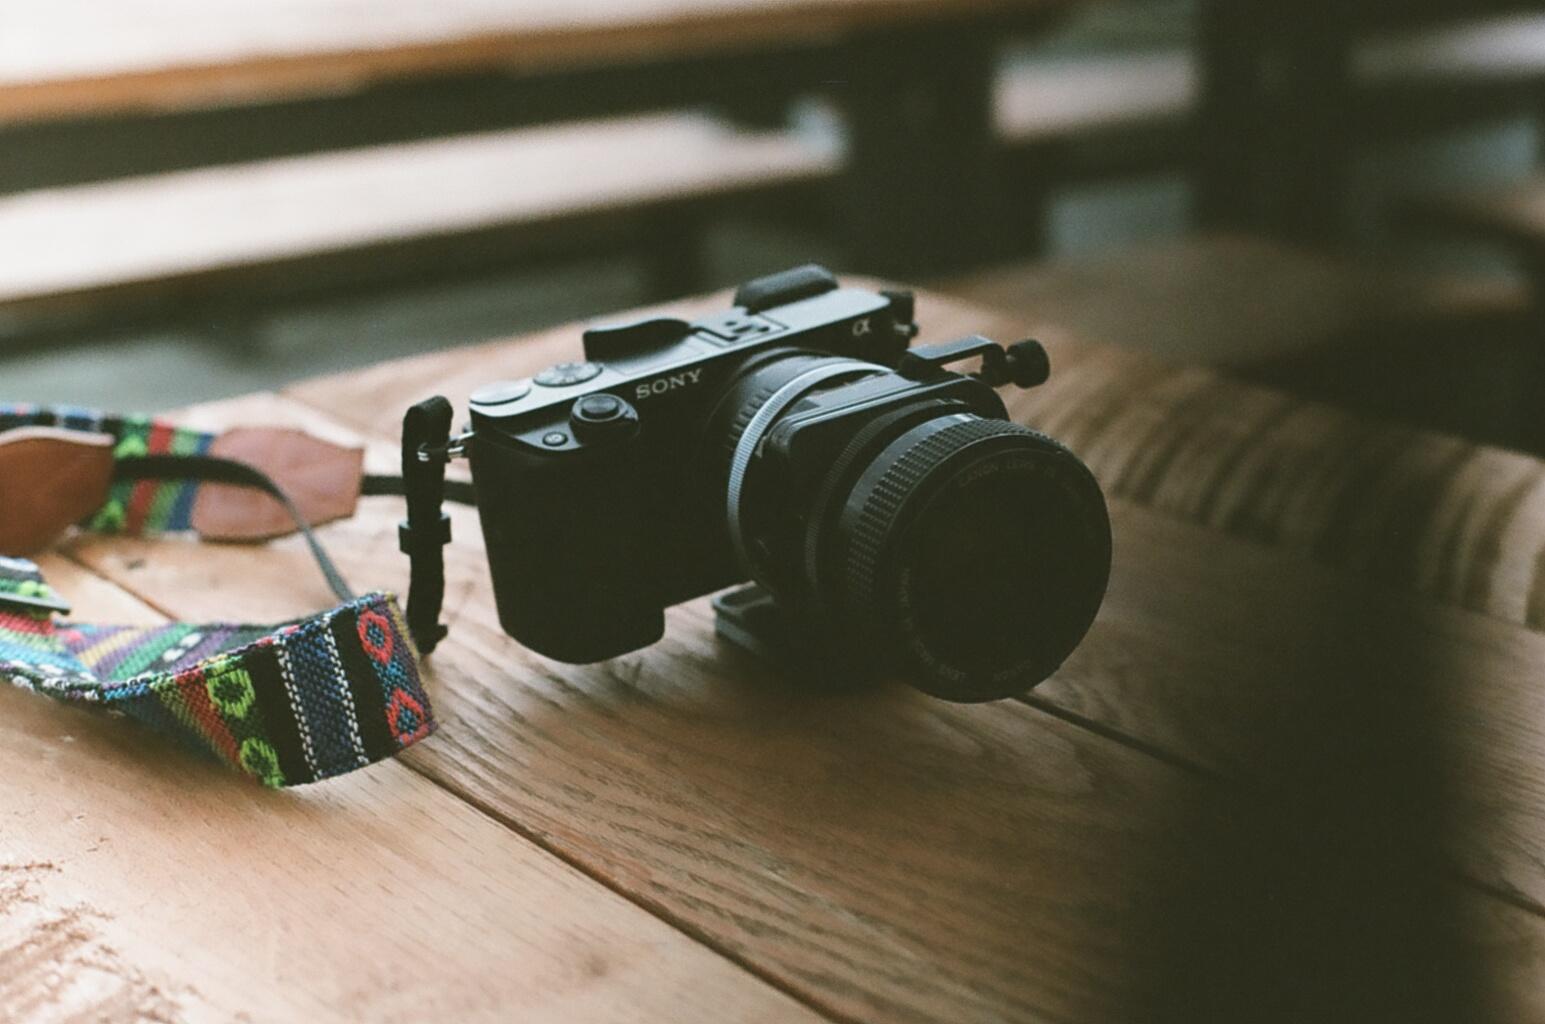 Going Analog, Full 35mm Photography Kit, sony a6000 with tilt-shift lens